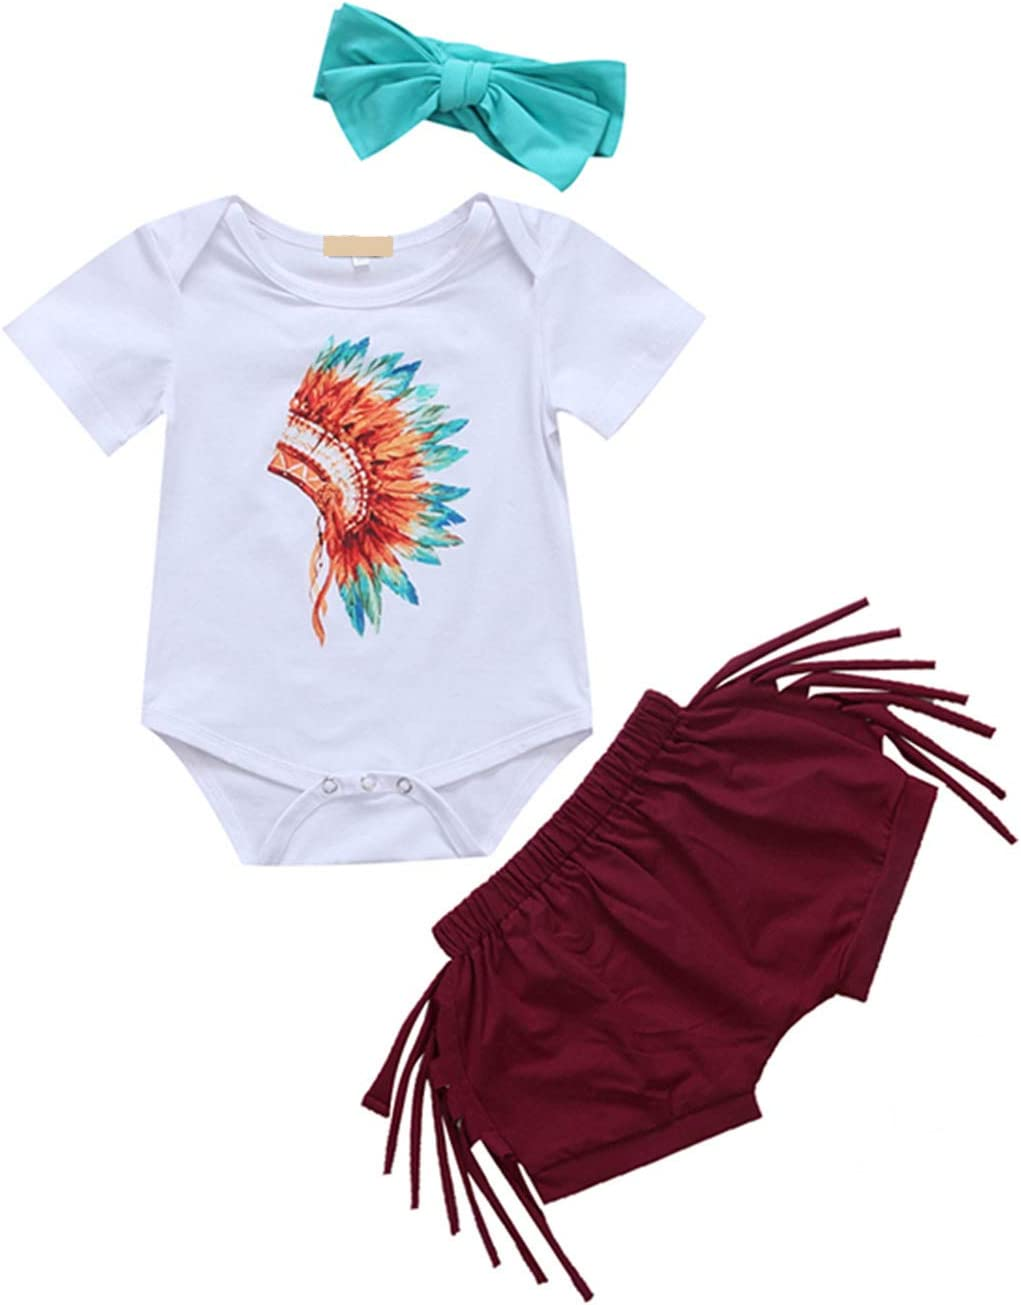 3PCS Newborn Baby Girl Clothes Children Kids Short Sleeve Romper Tops+Tassel Shorts Bottom Headband Outfits Sunsuit 18M,as picture